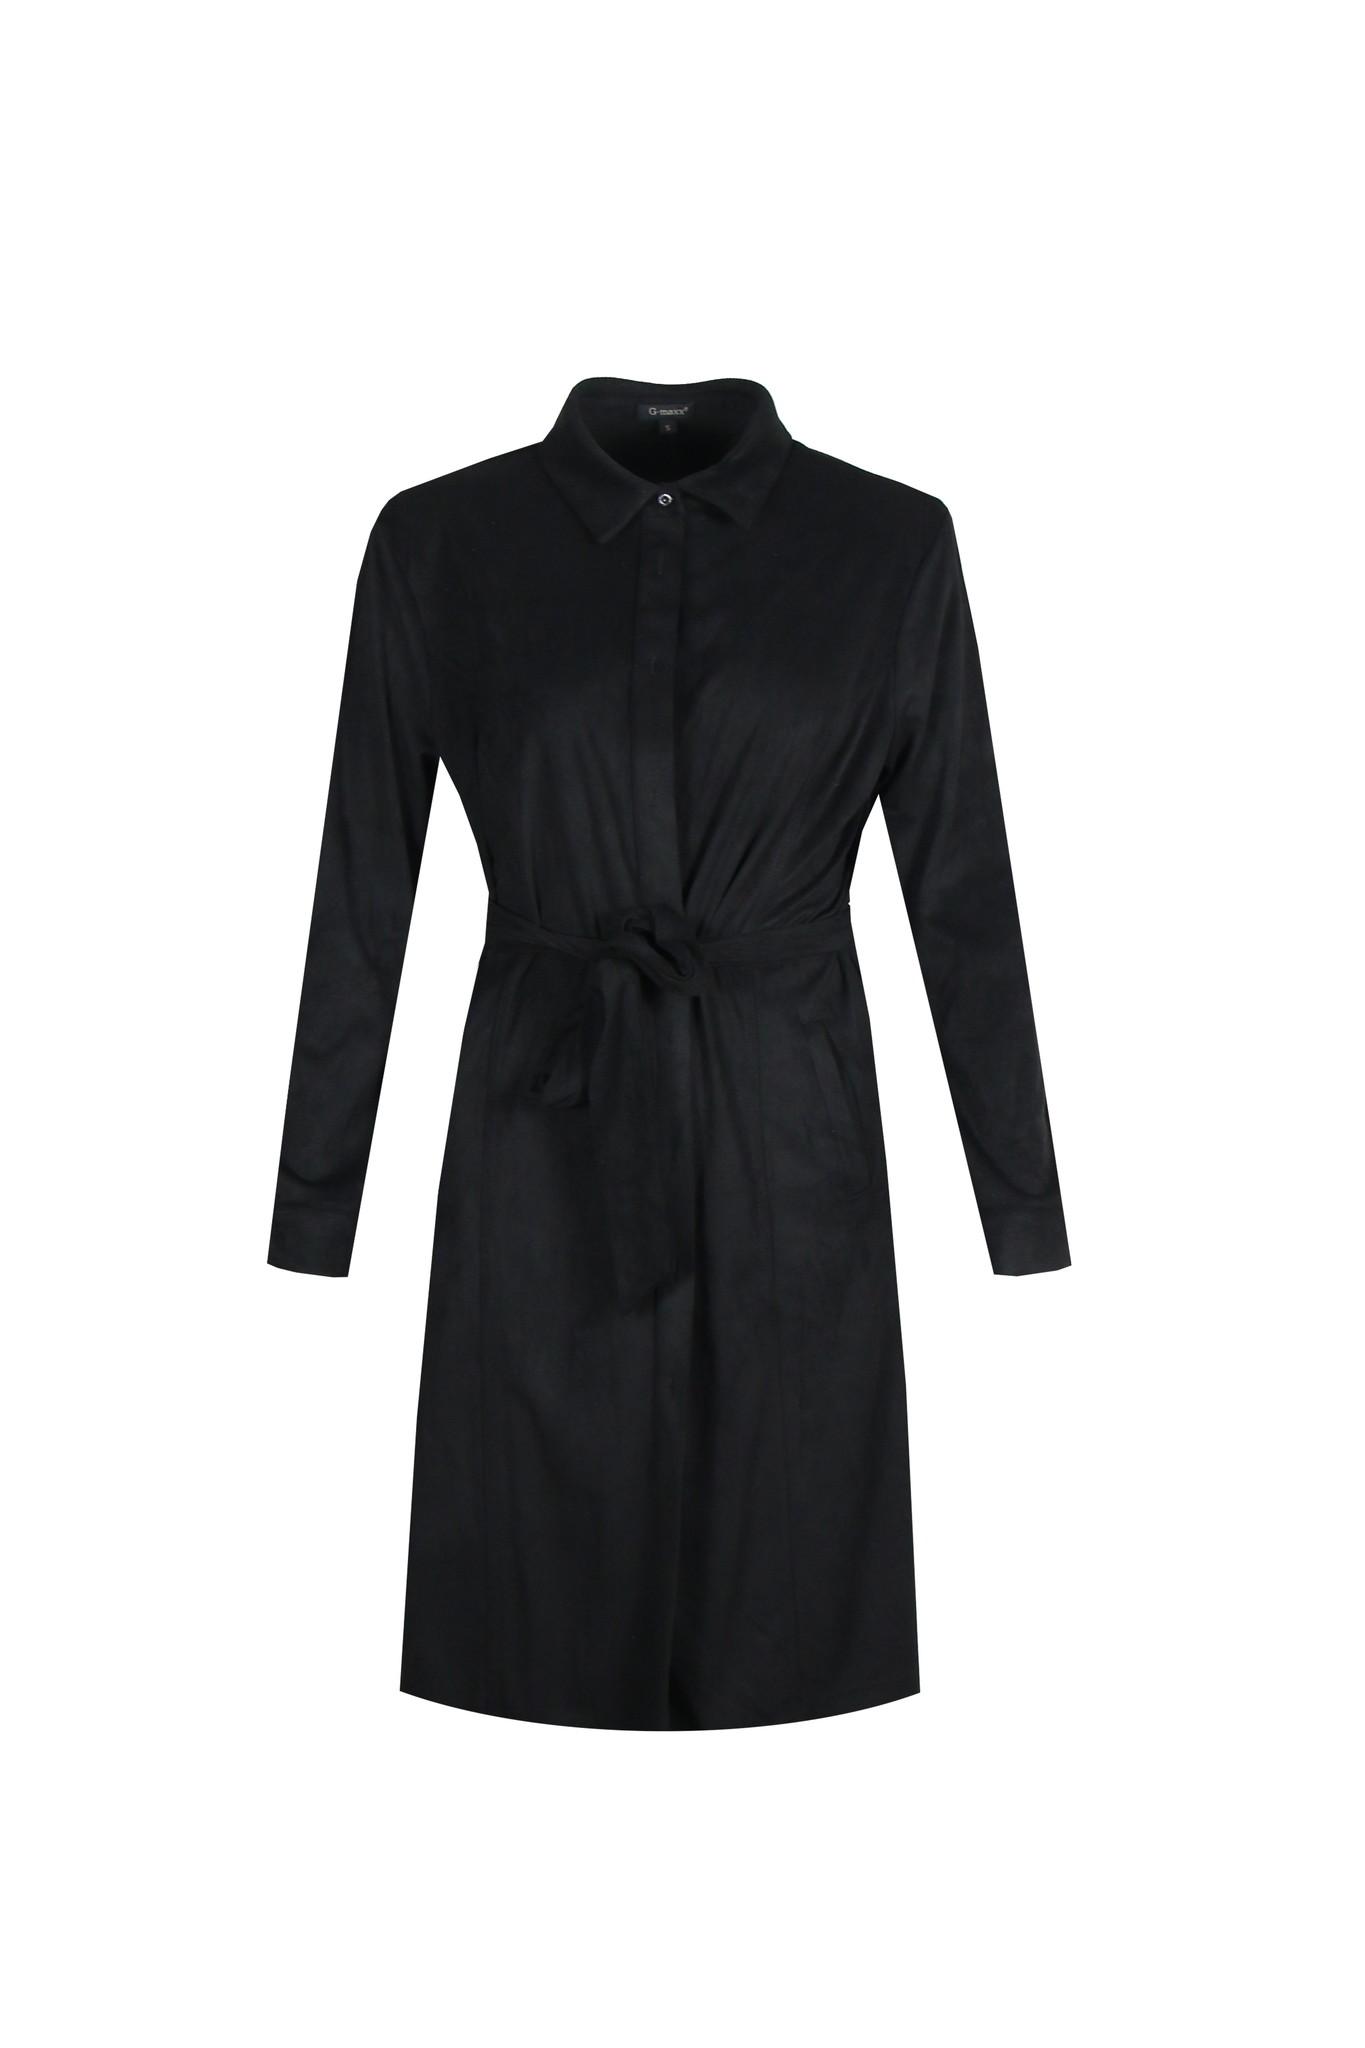 G-Maxx G-Maxx Gladys jurk zwart